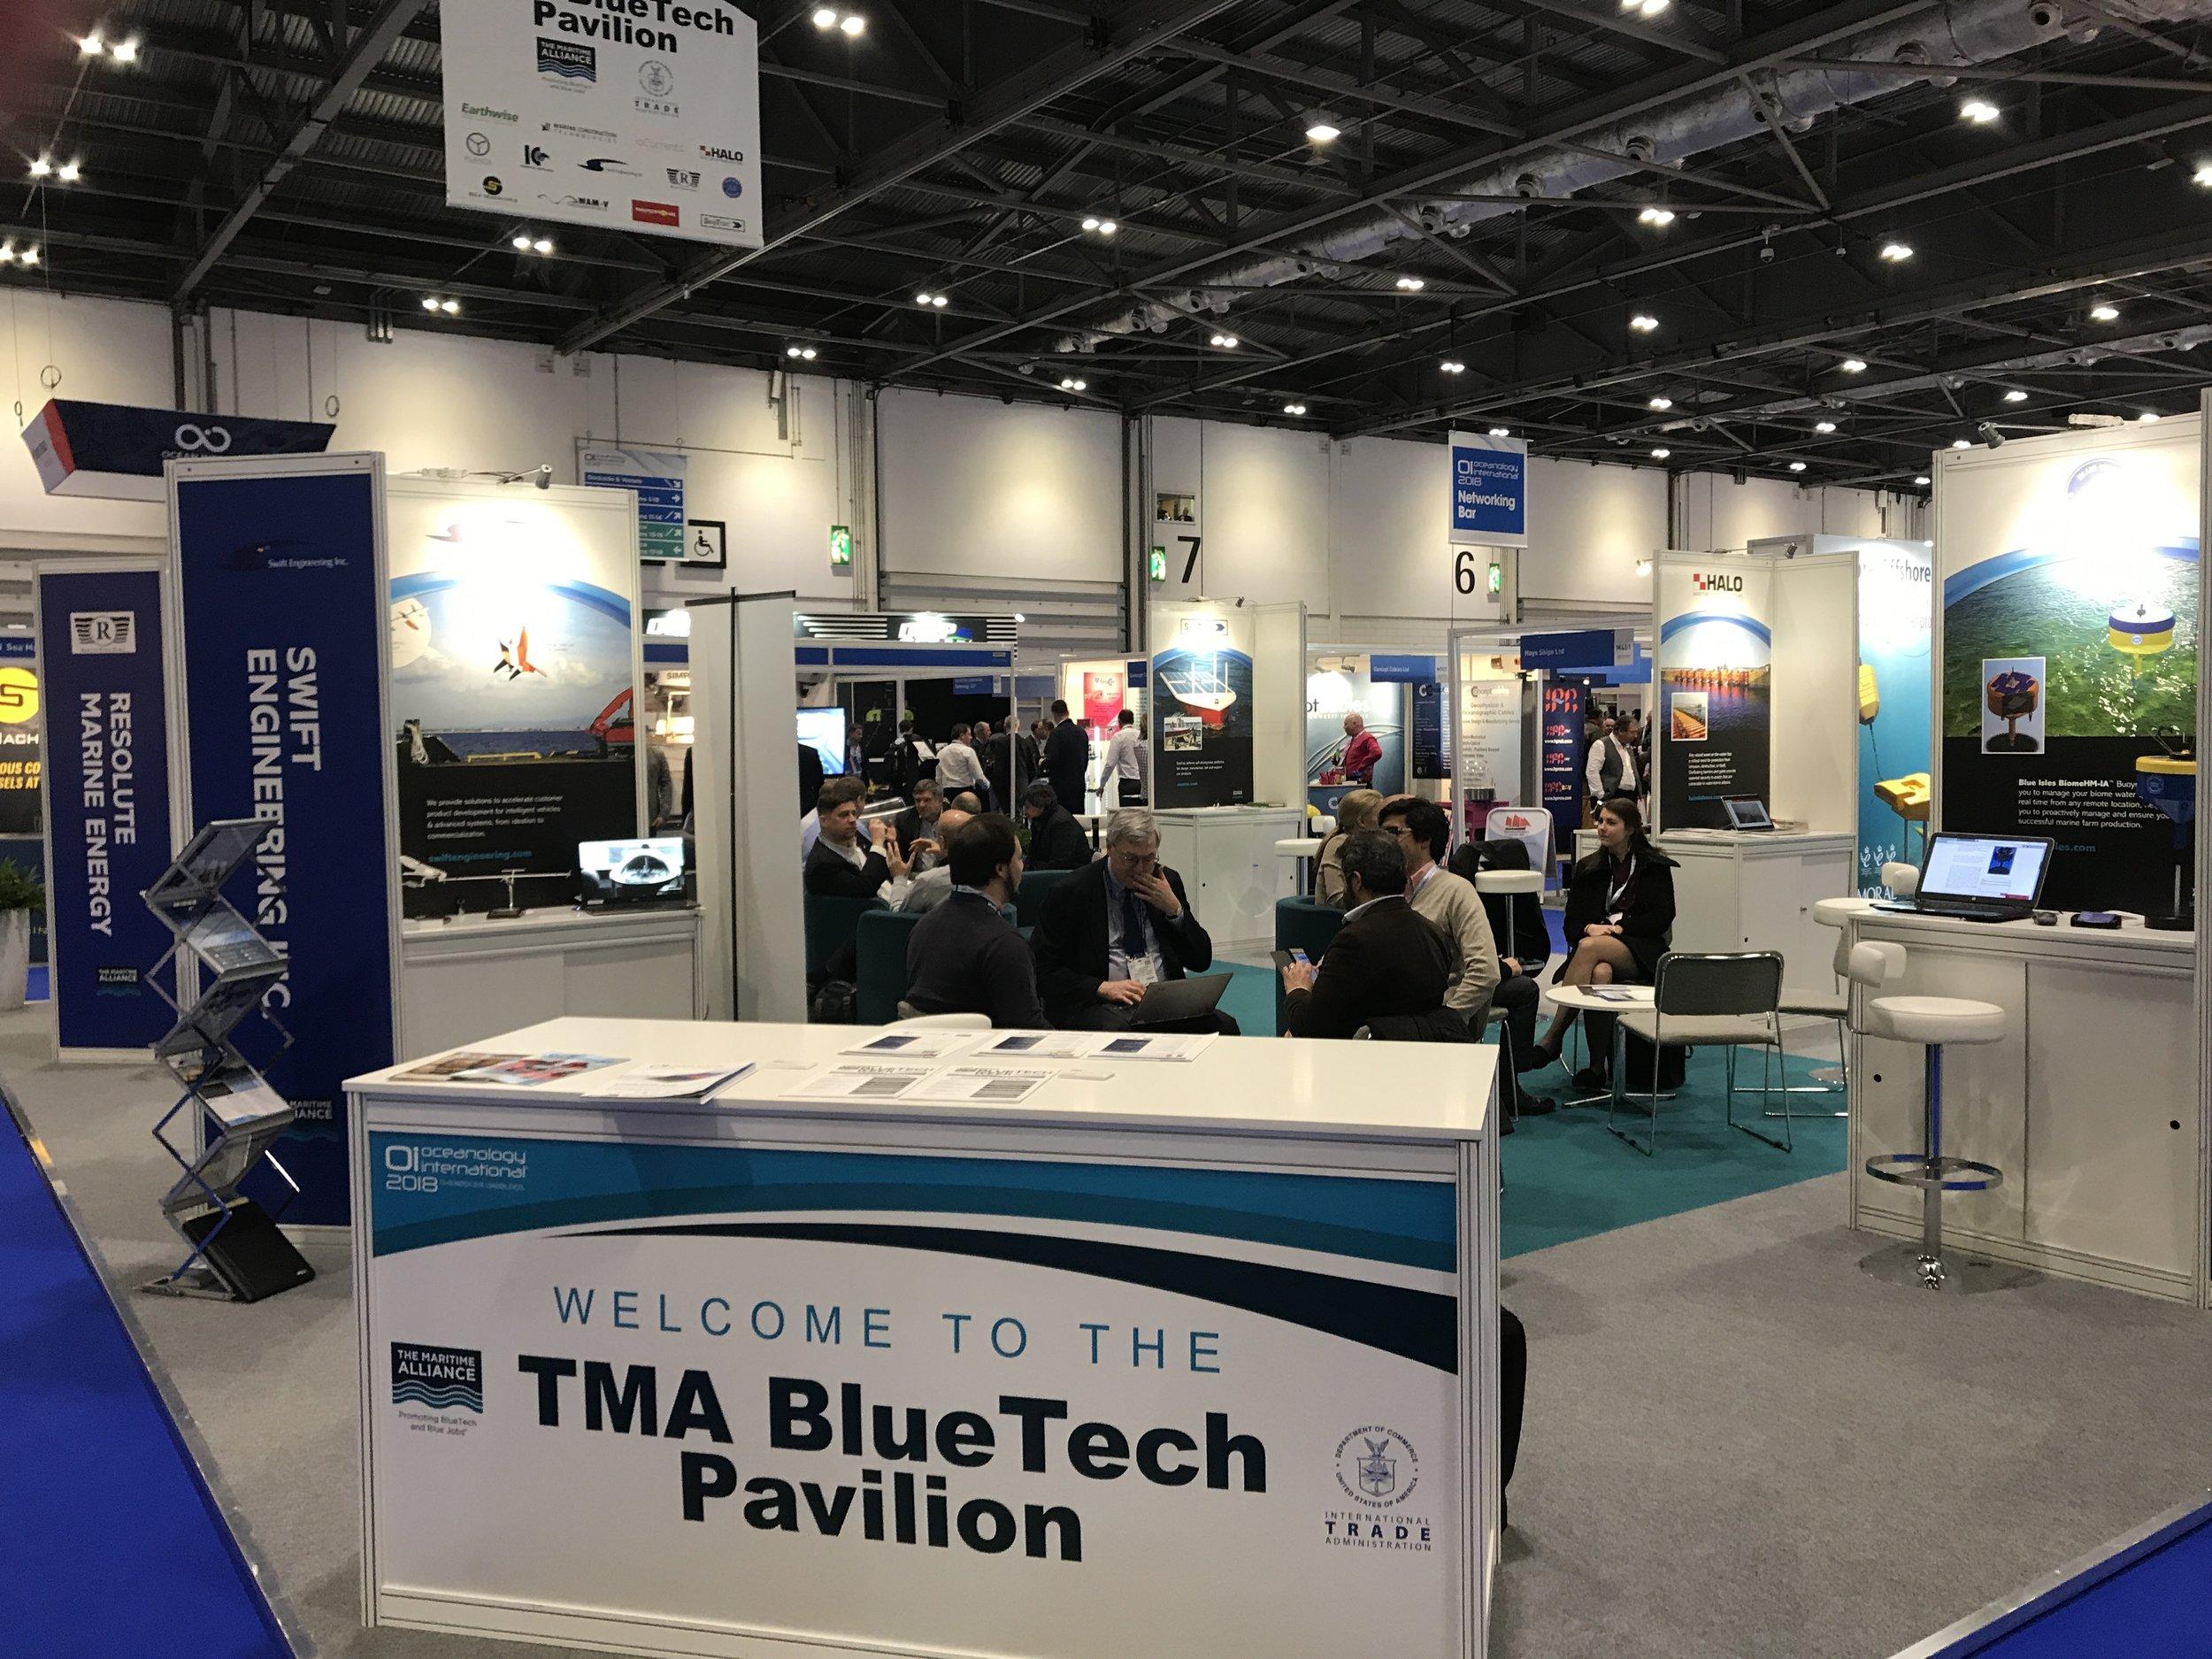 USMTEI 2018 Oi TMA BlueTech Pavilion.JPG